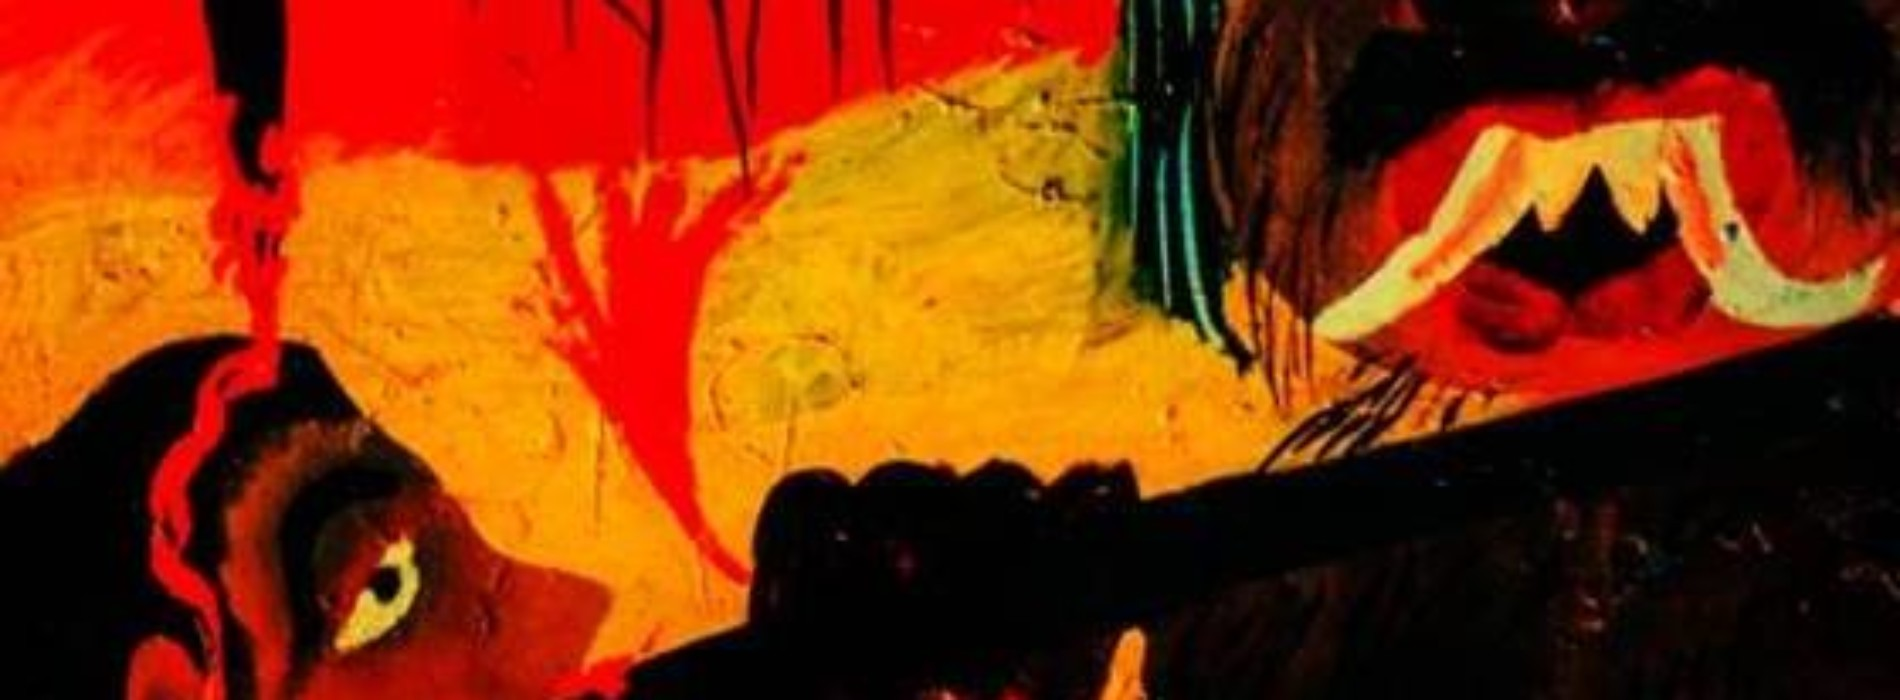 Plecto Aliquem Capite – The End & More News